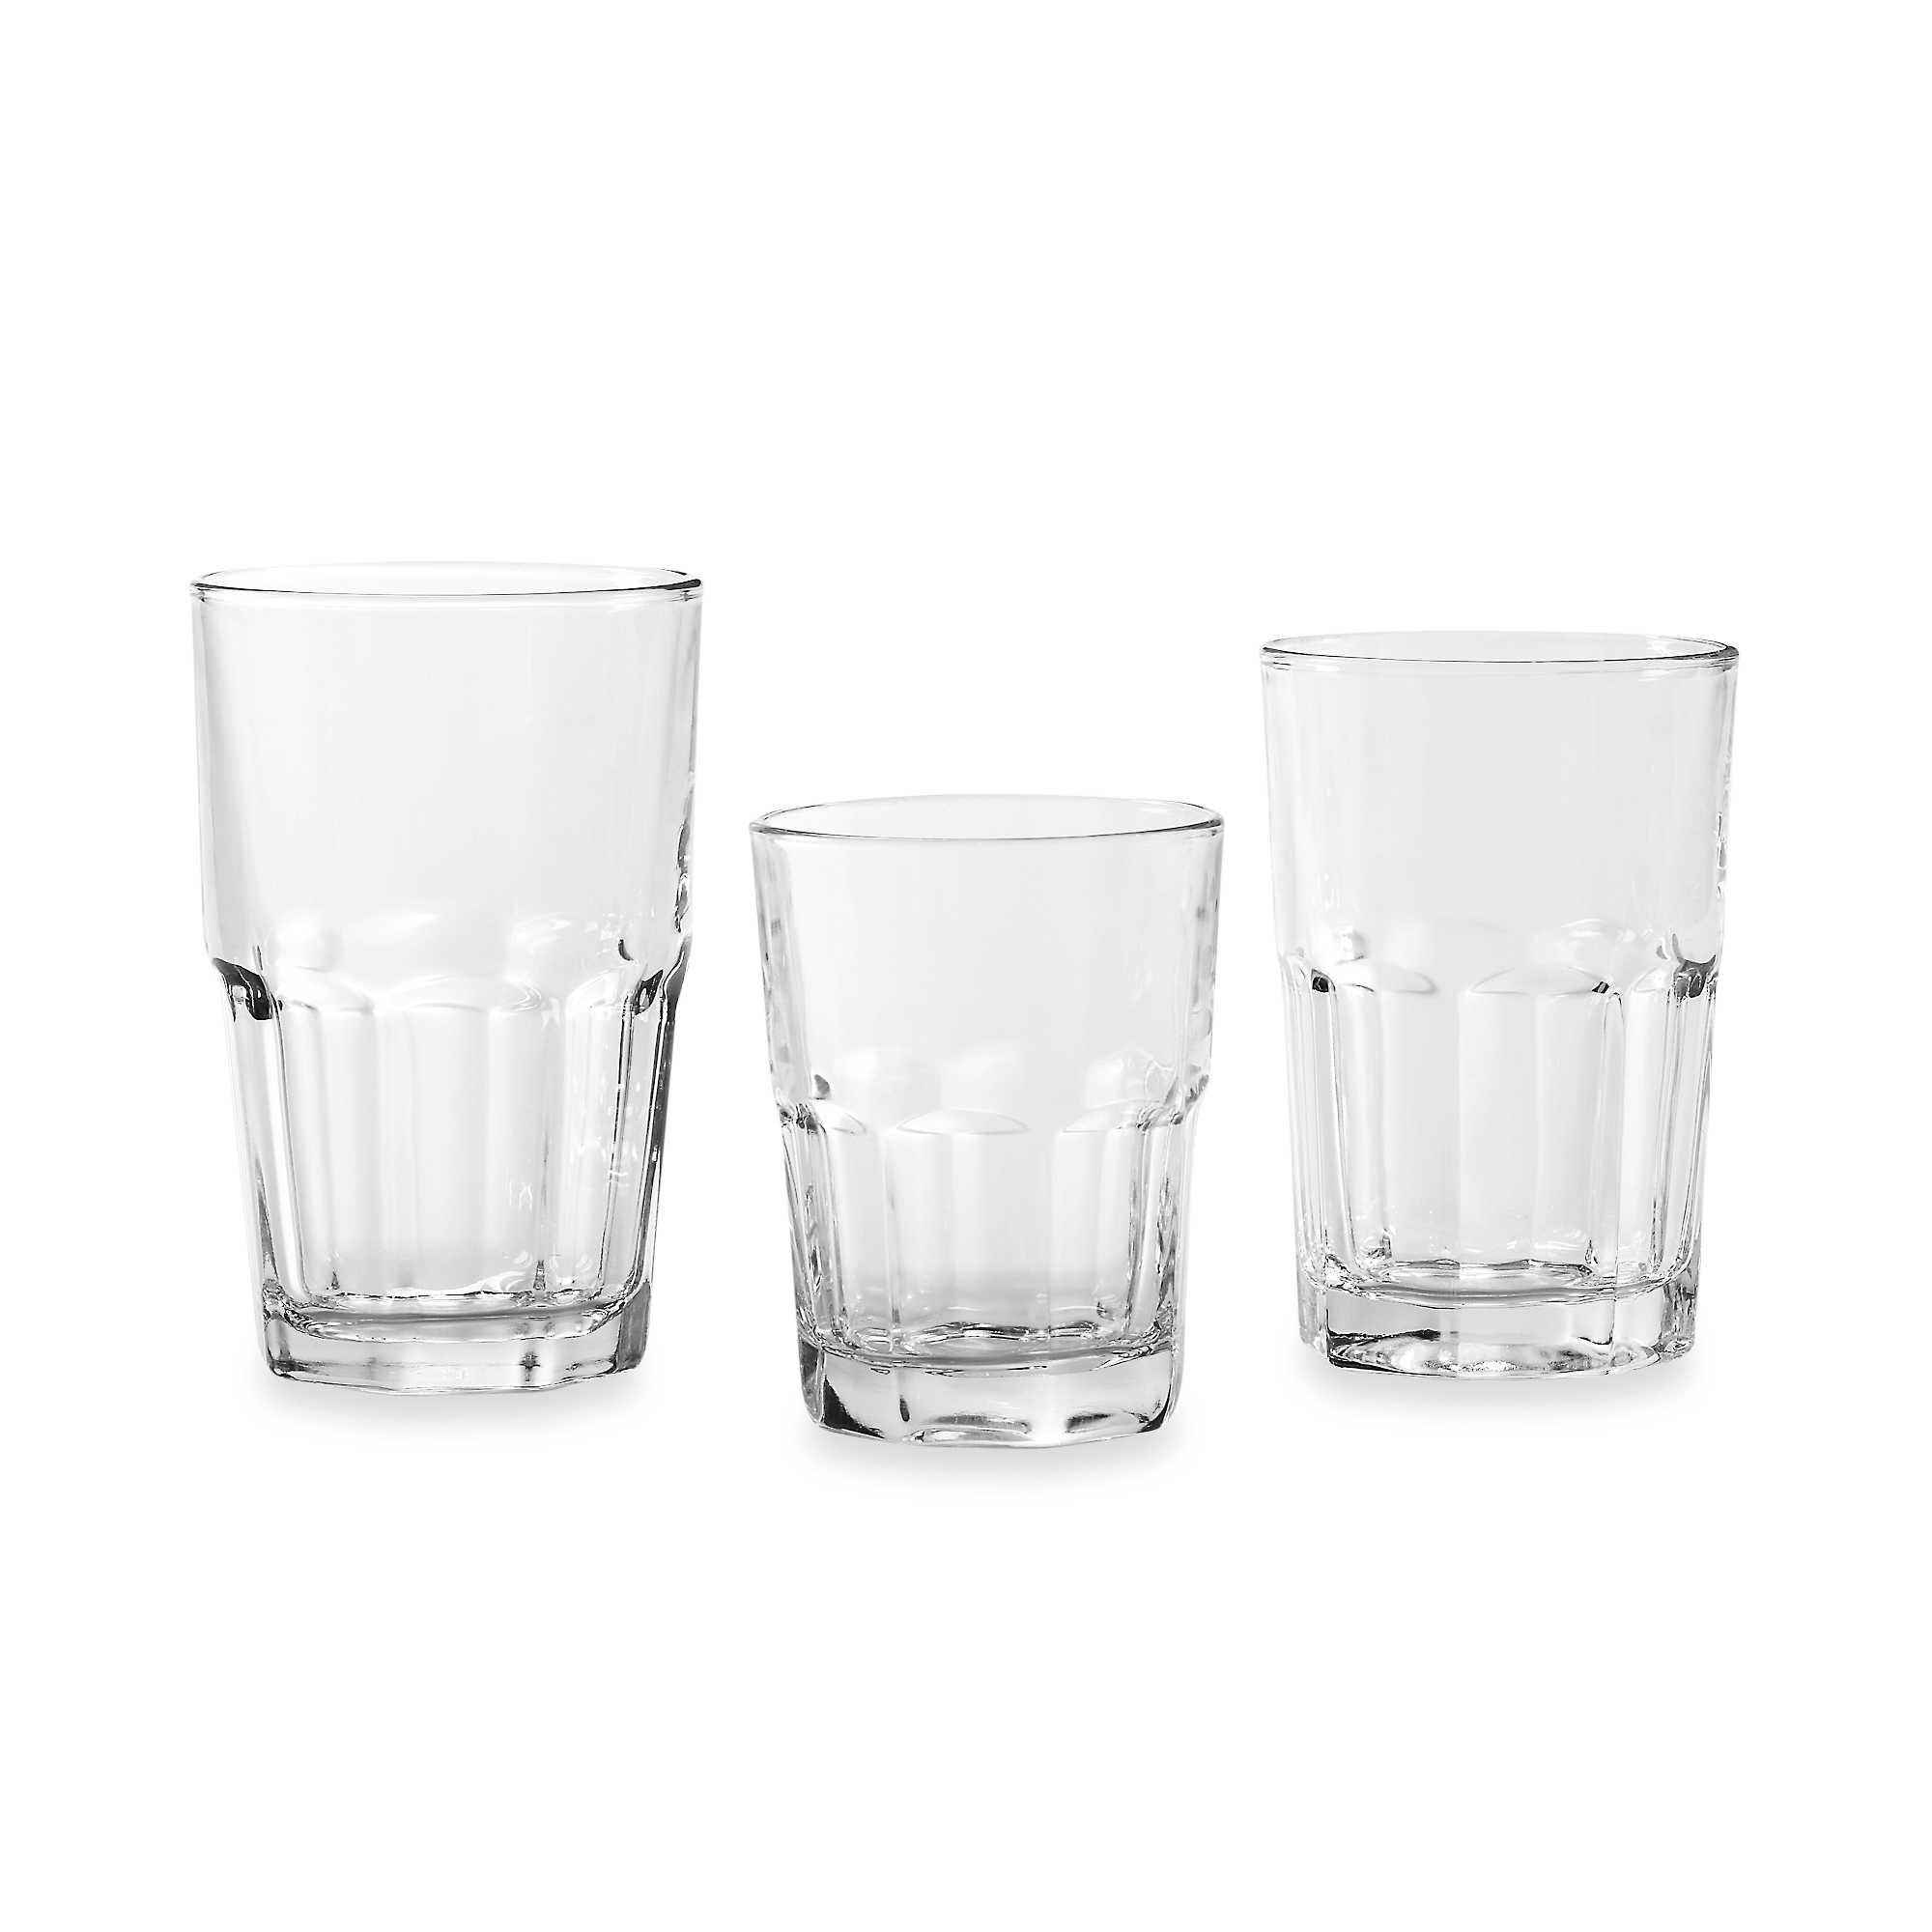 Libbey® Classic & Casual Design Crisa Boston 18-Piece Glassware Set your Everyday Drinkware